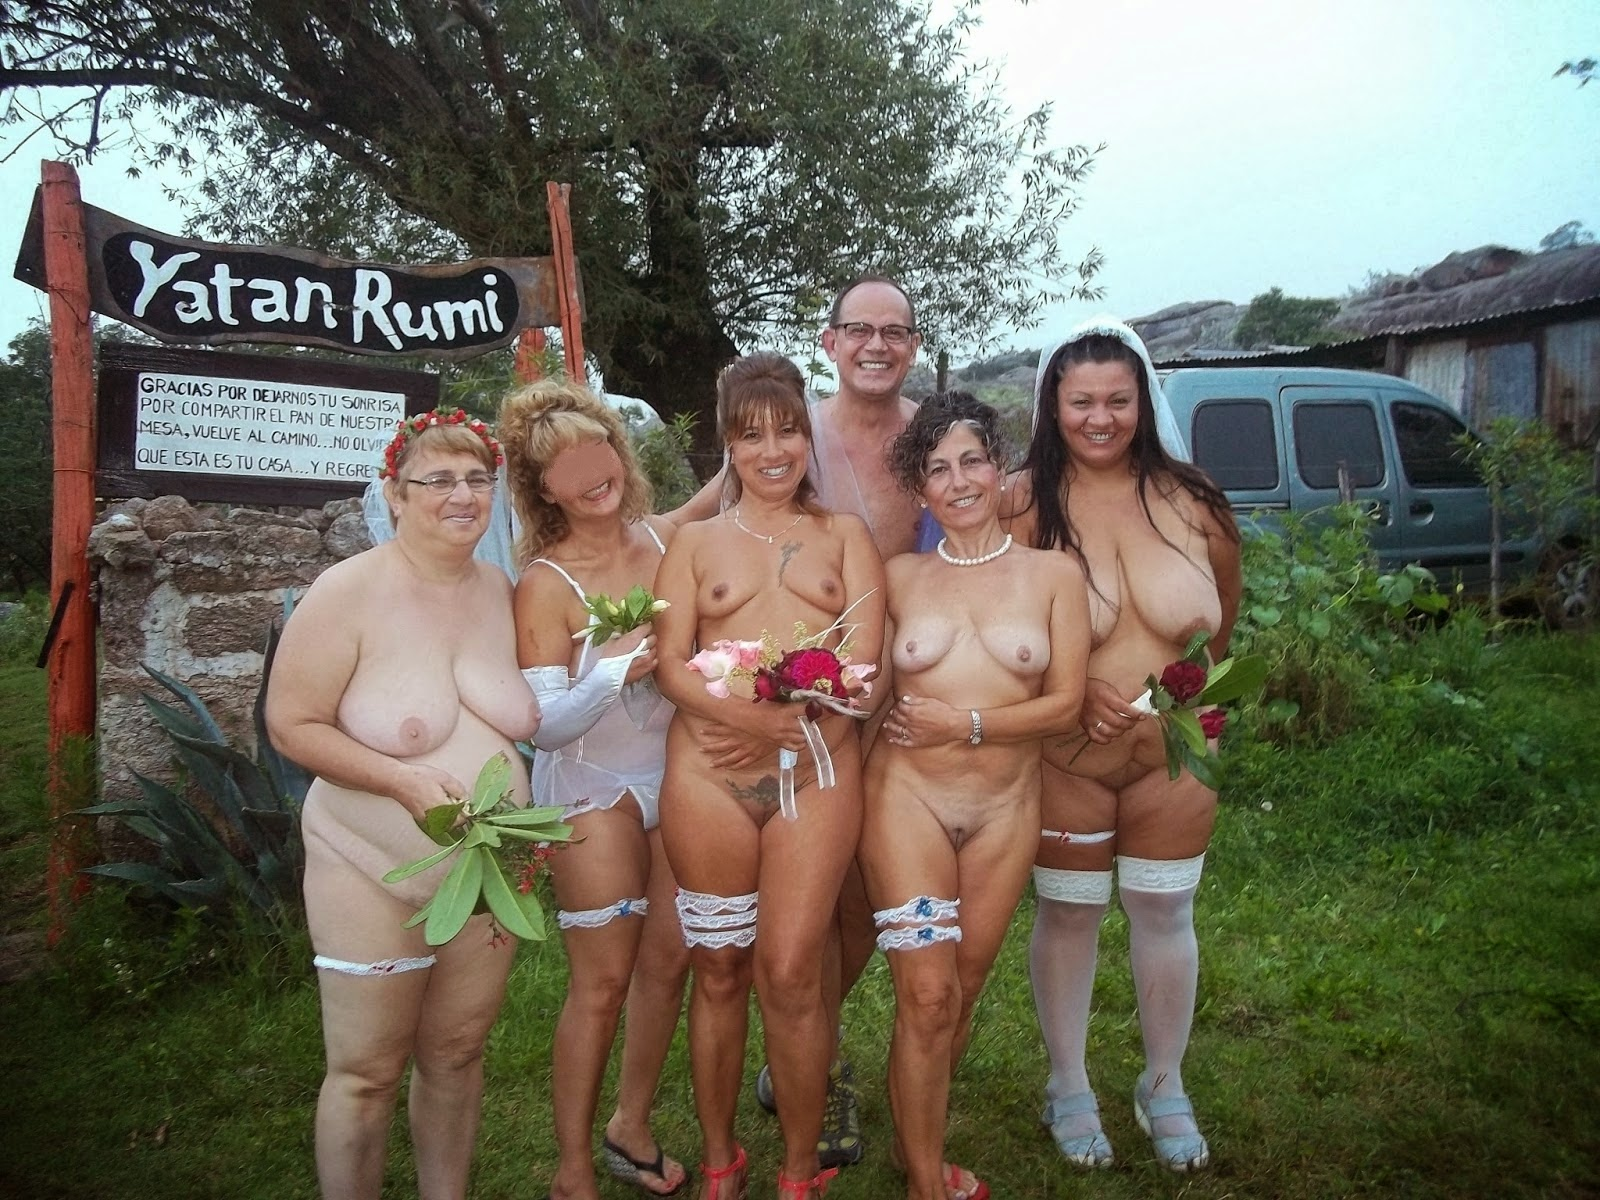 Ordinary amateur mature naked women